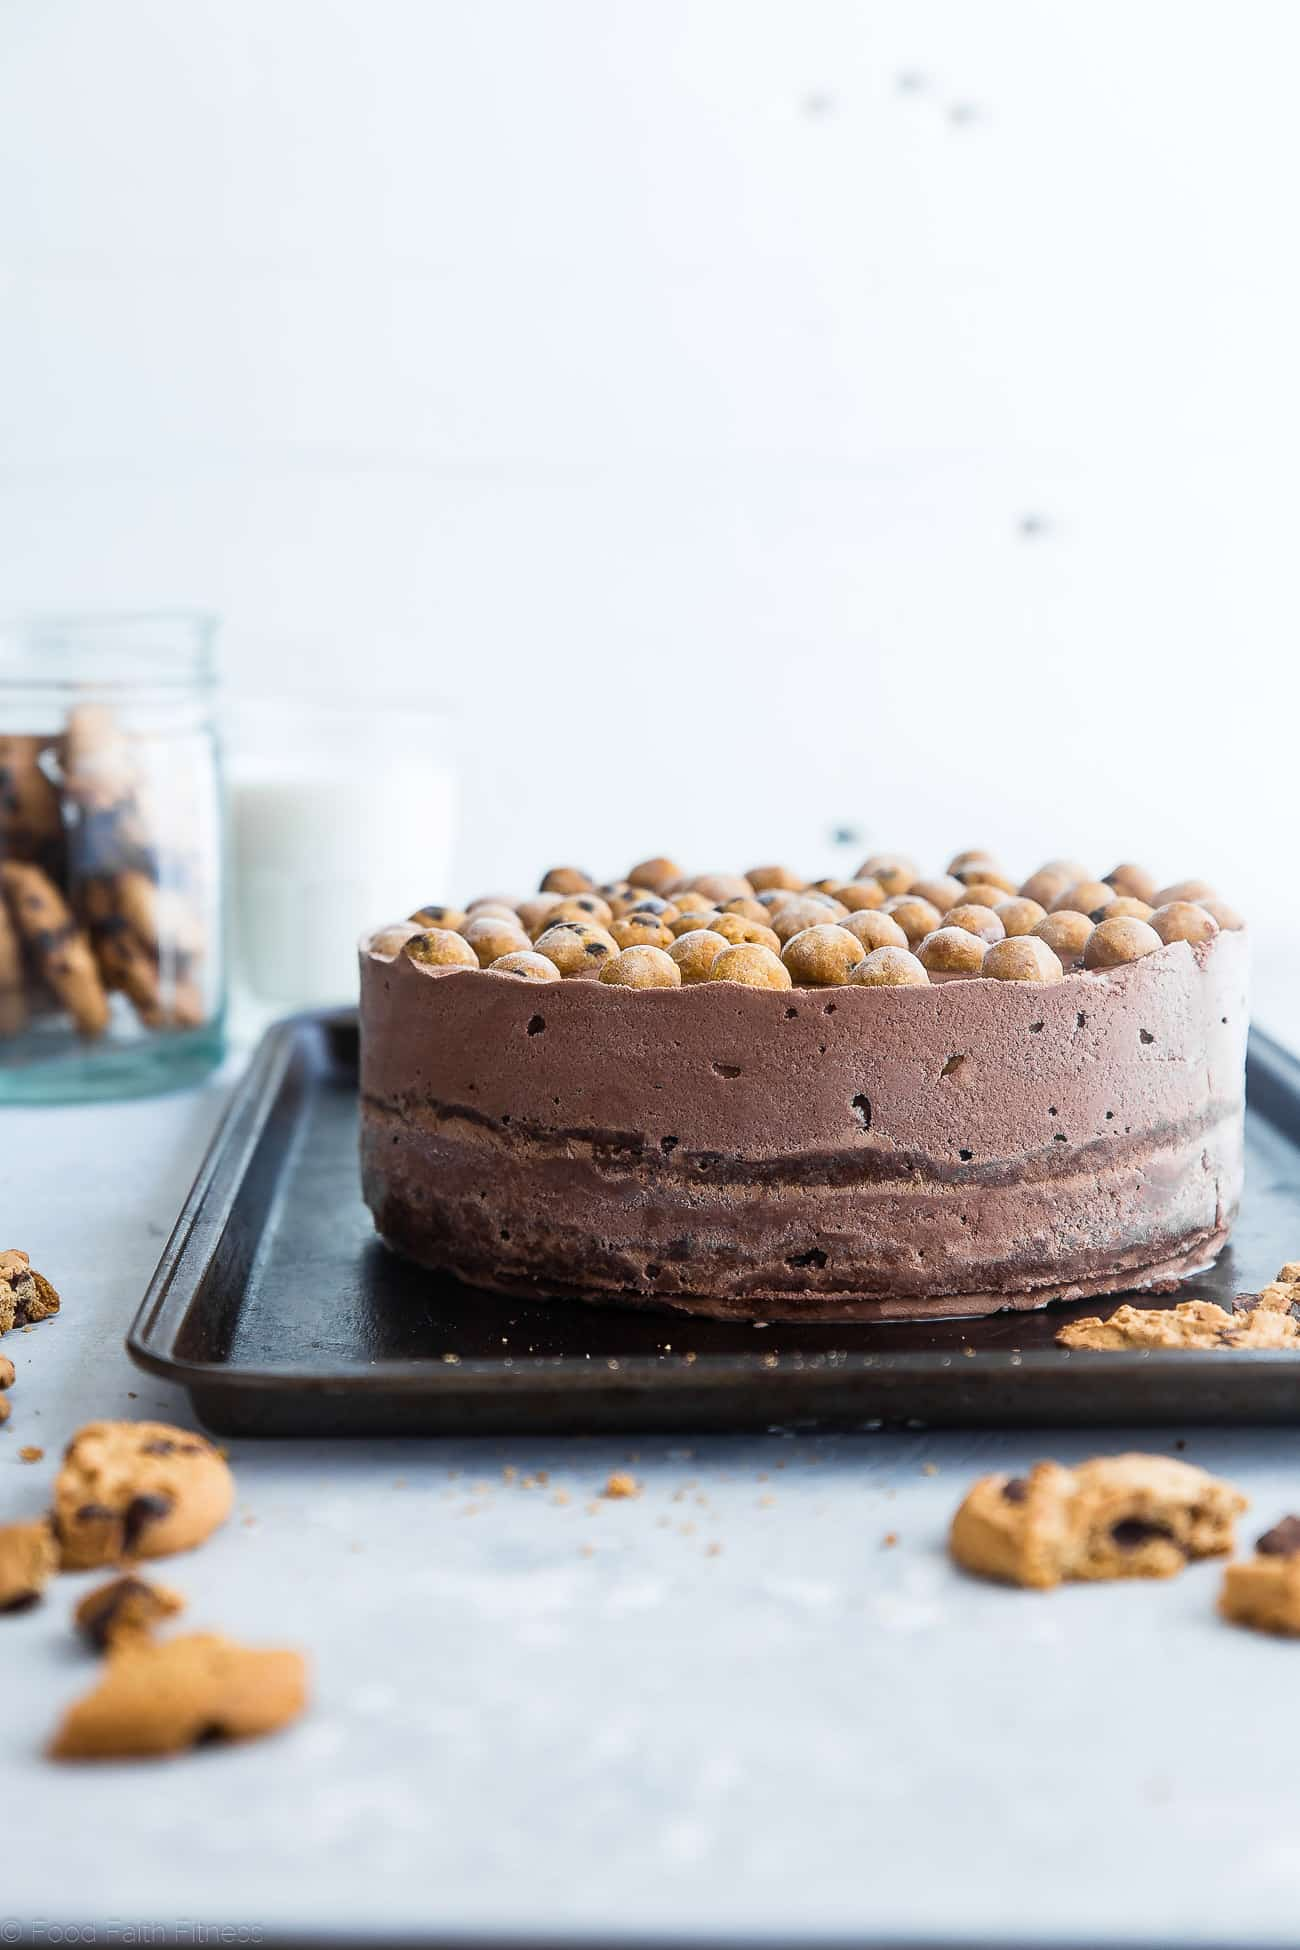 Healthy Cookie Dough Ice Cream Cake -This easy homemade ice cream cake uses healthy chocolate ice cream and bites of chickpea cookie dough for a grain and gluten free, lighter dessert that everyone will love! | Foodfaithfitness.com | @FoodFaithFit